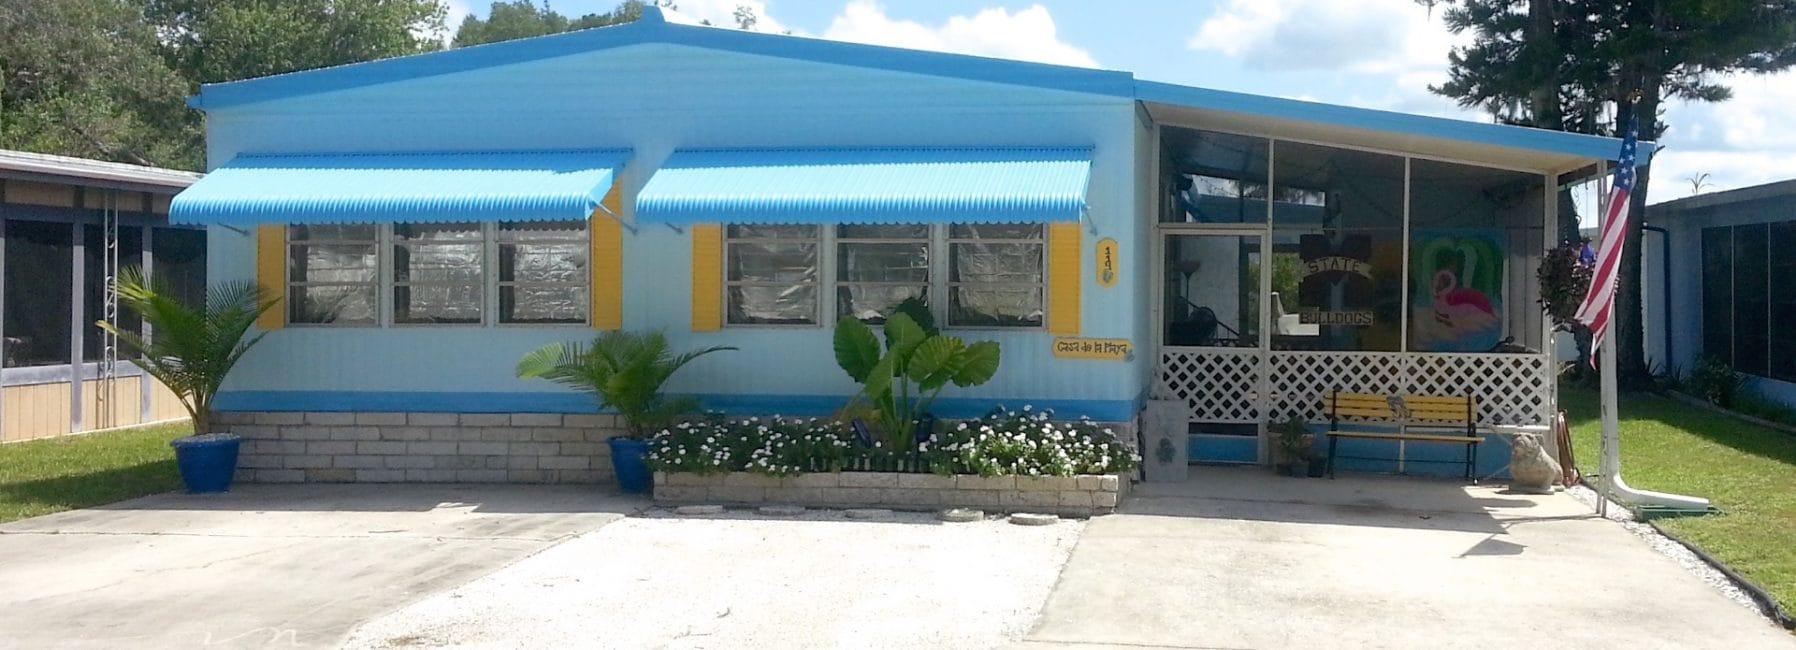 Used Mobile Home For Sale - Tarpon Springs, FL